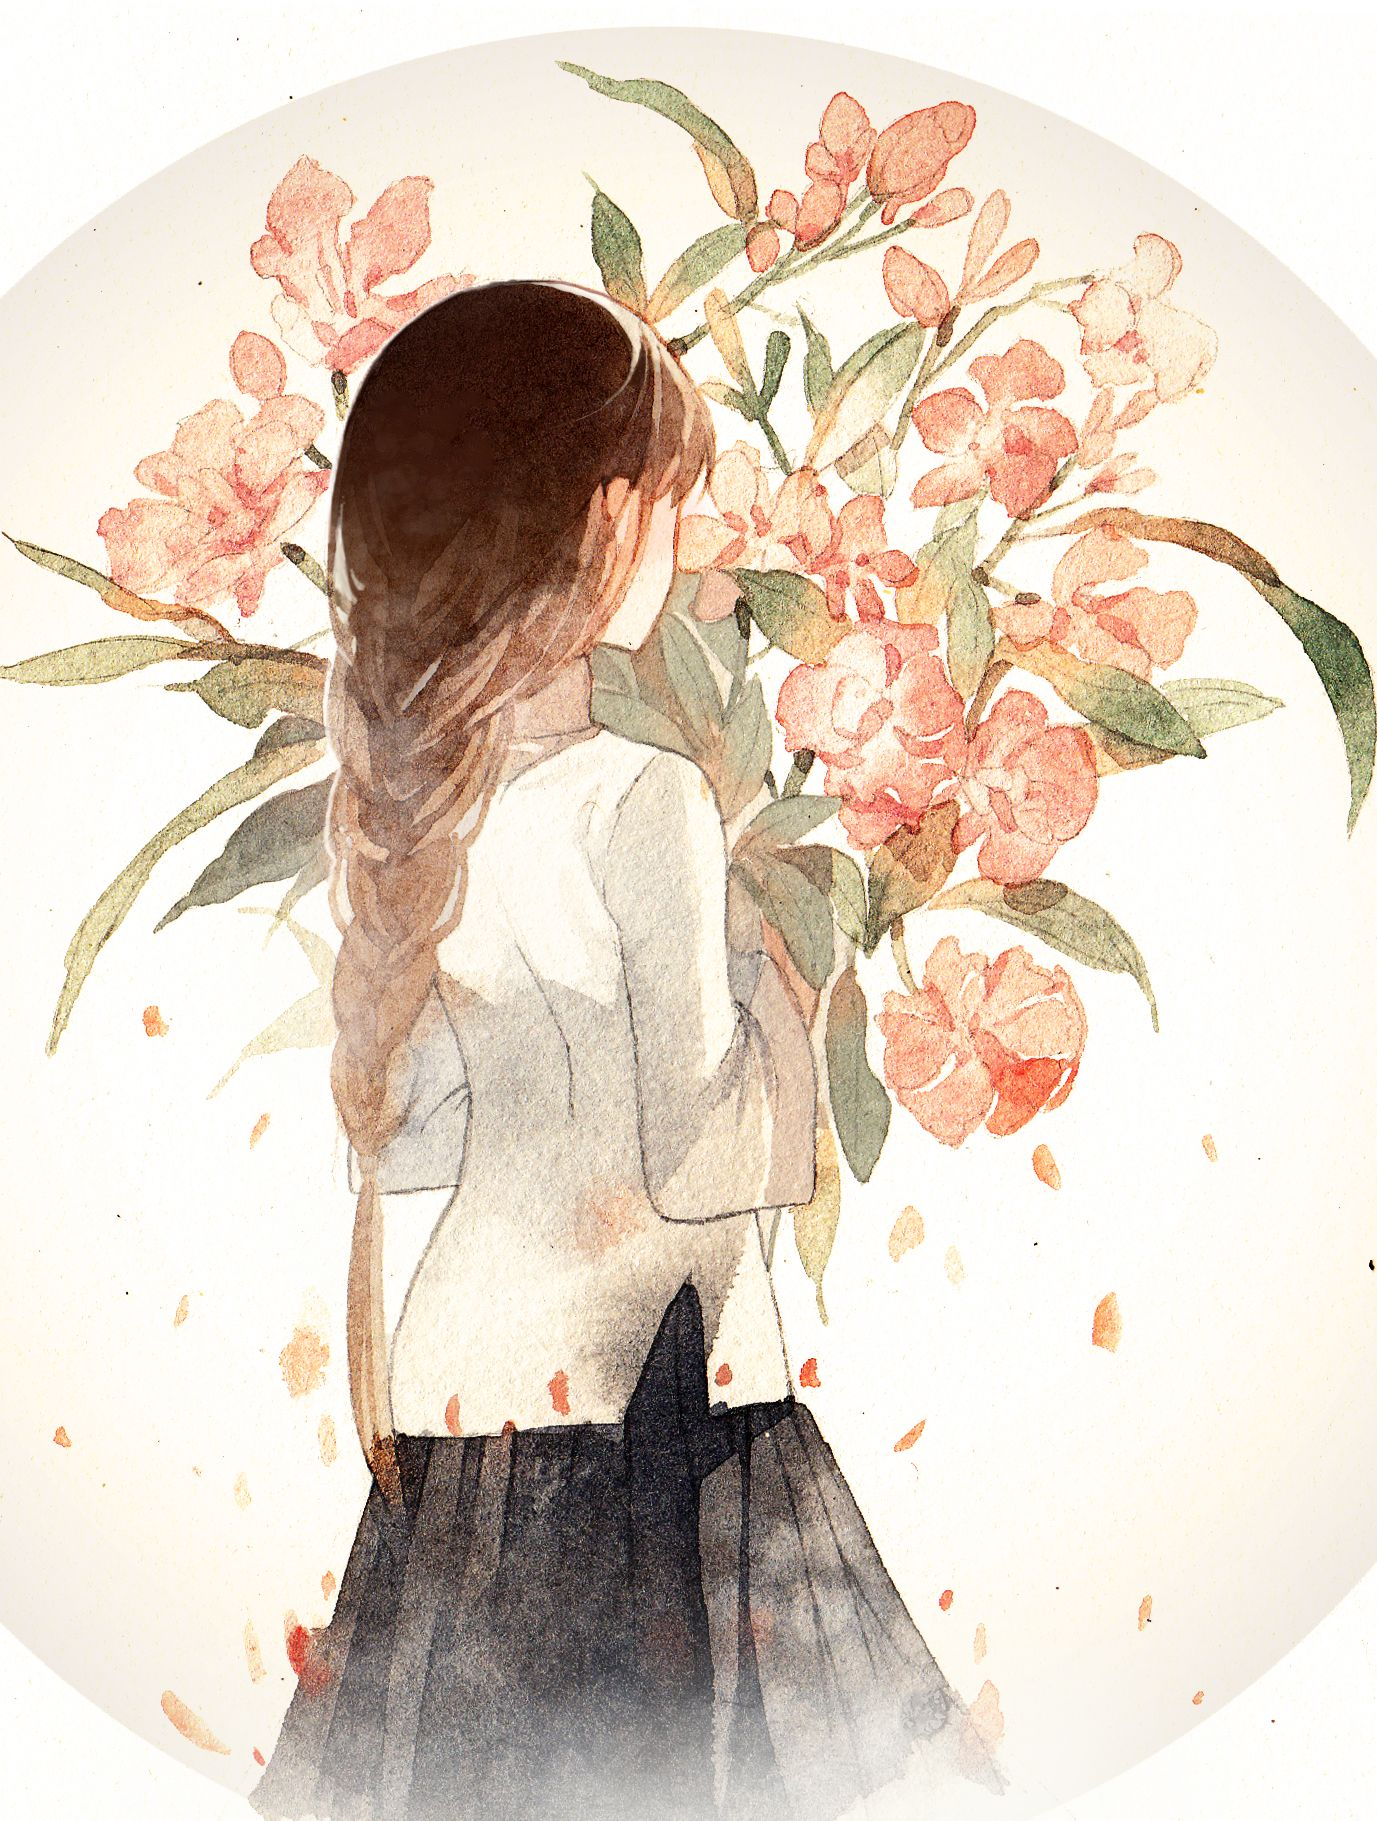 anime girl with brown hair, braid, white sleeved shirt, skirt and